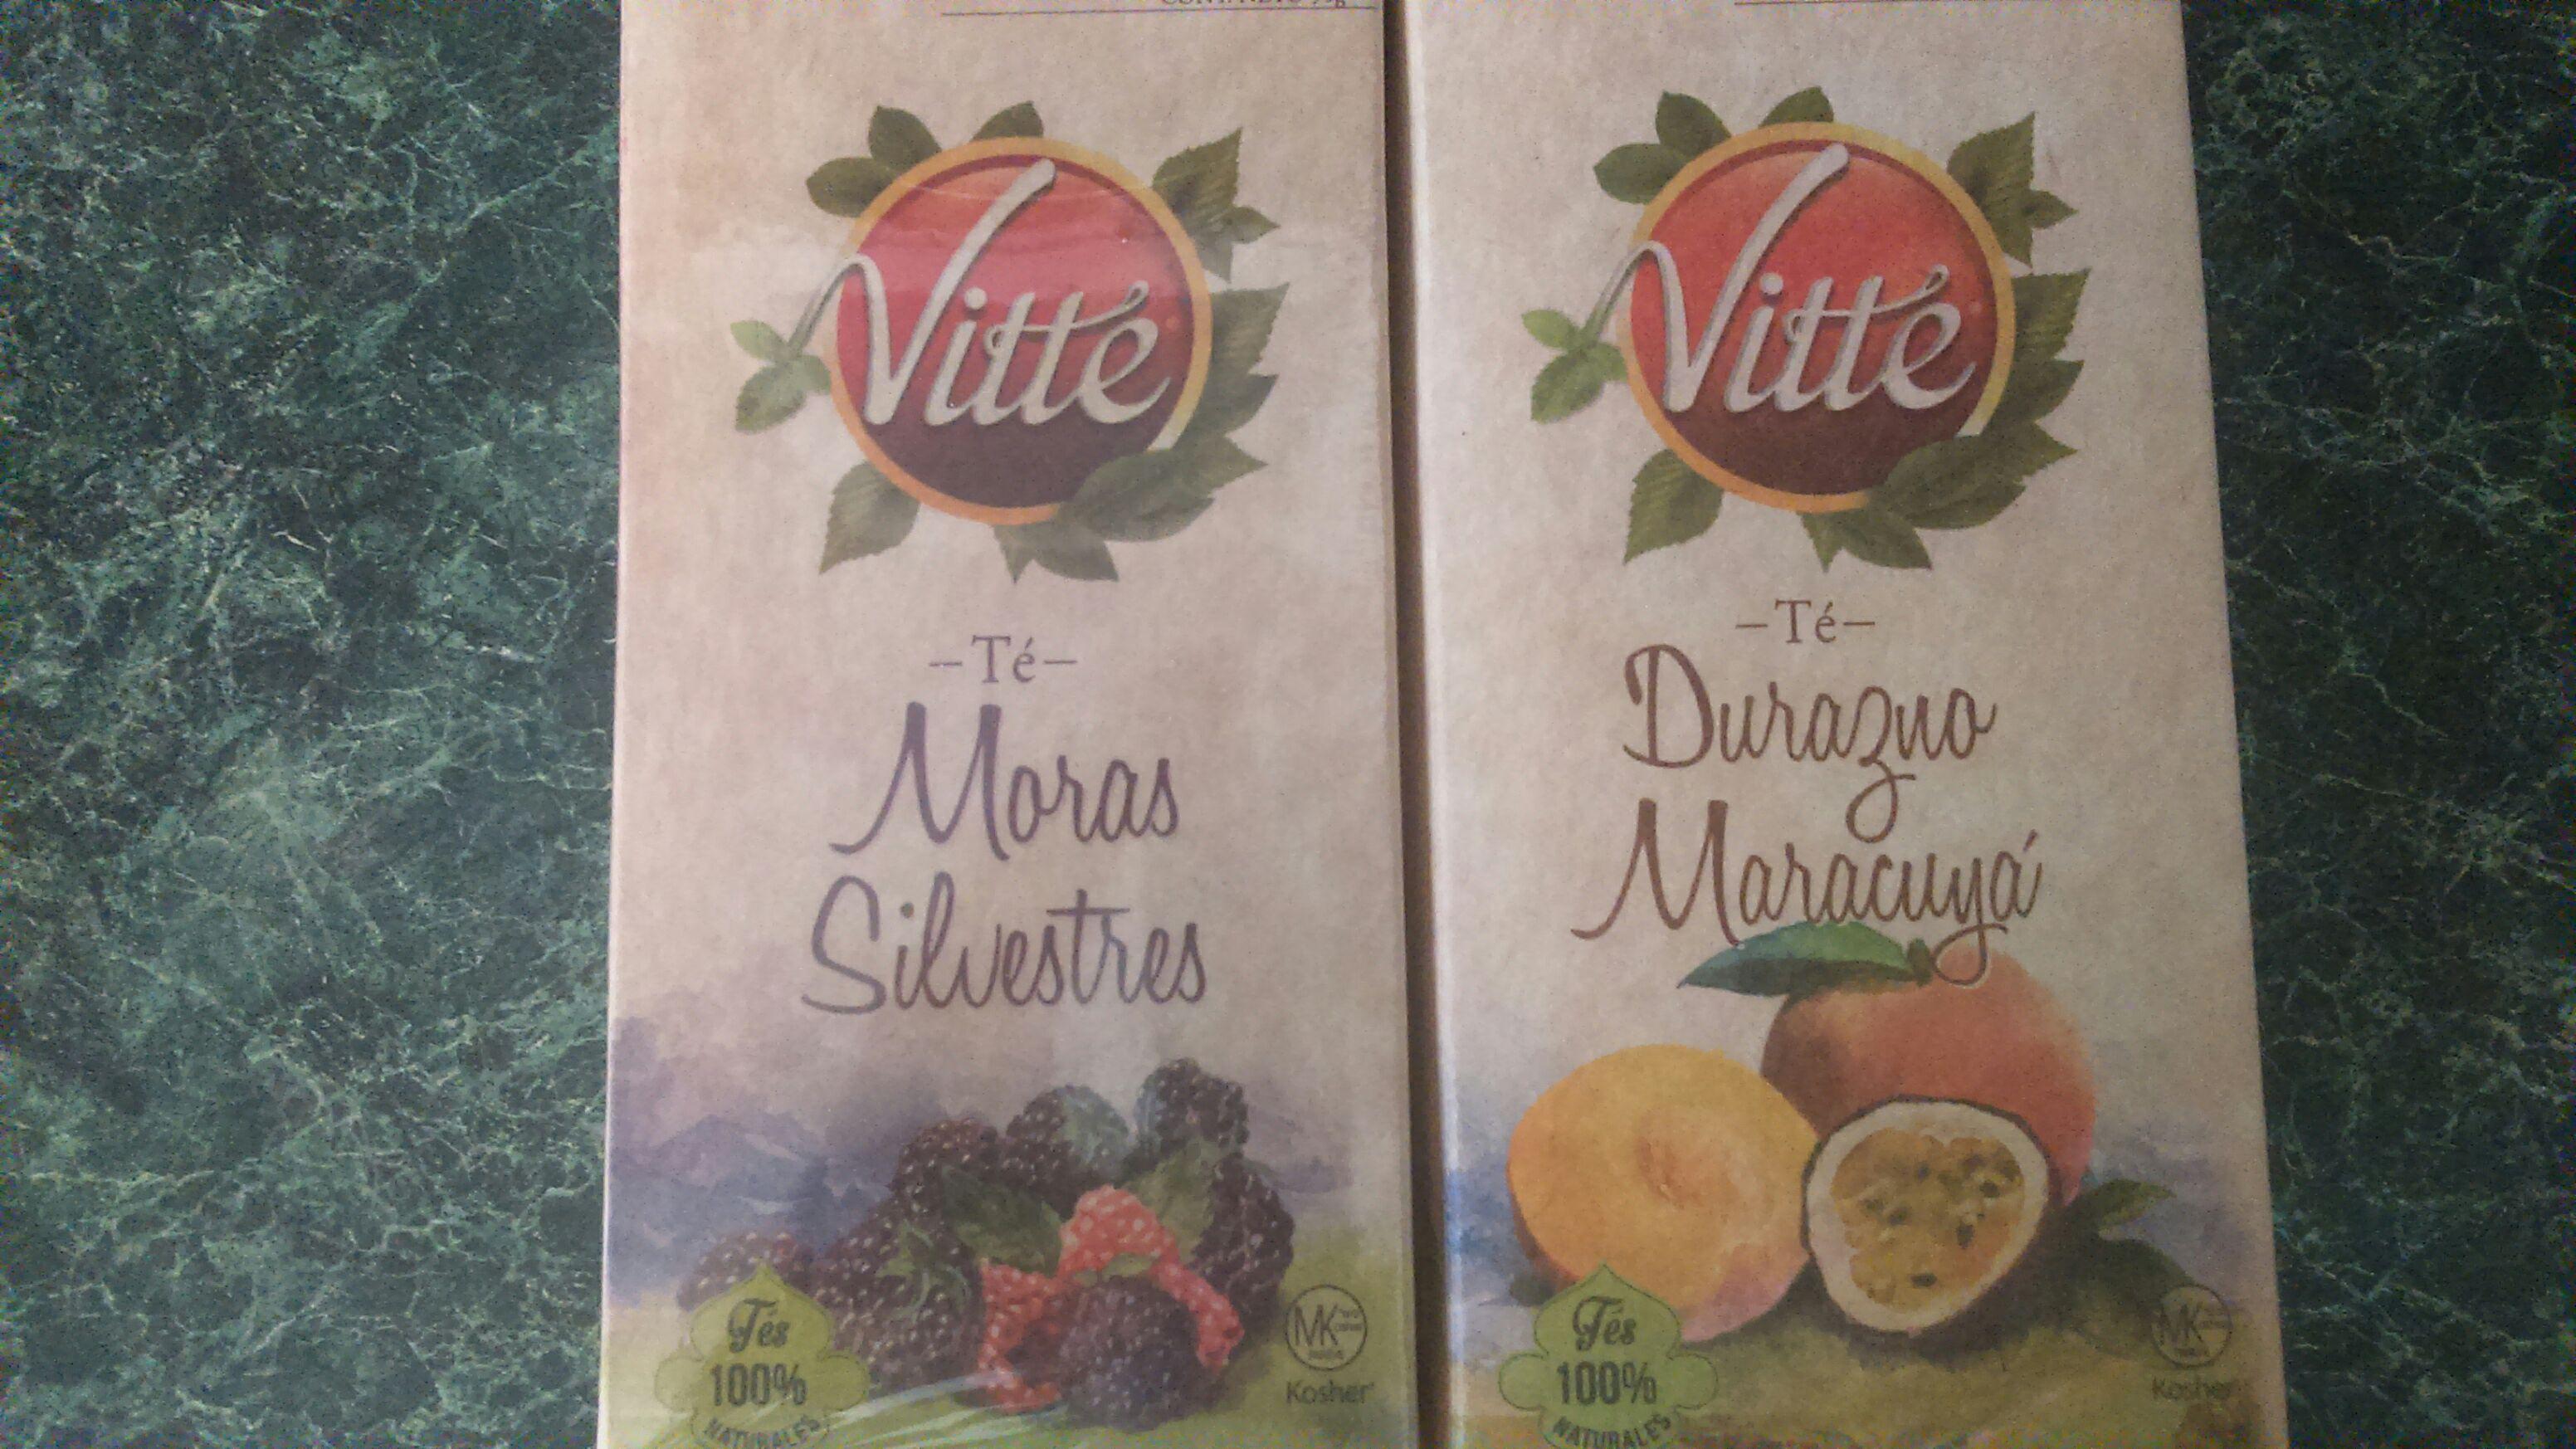 Walmart: Té Vitte de Durazno Maracuyá y Té de Moras Silvestres. $8.01